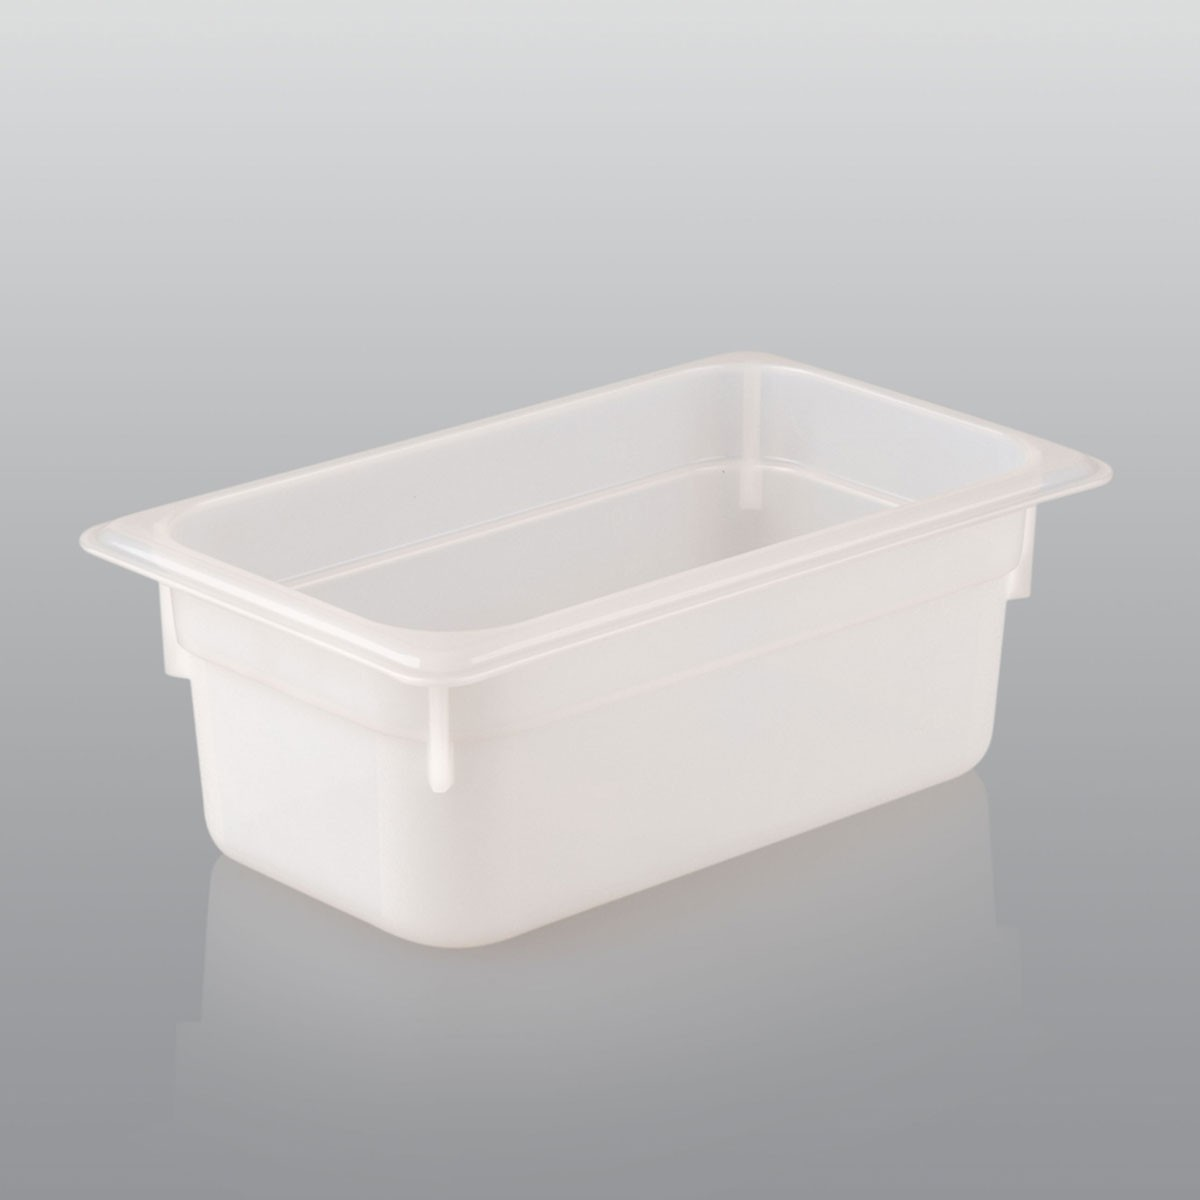 GN Behälter GN 1/4 aus Polypropylen (Tiefe: 100mm) 2,8 L Saro